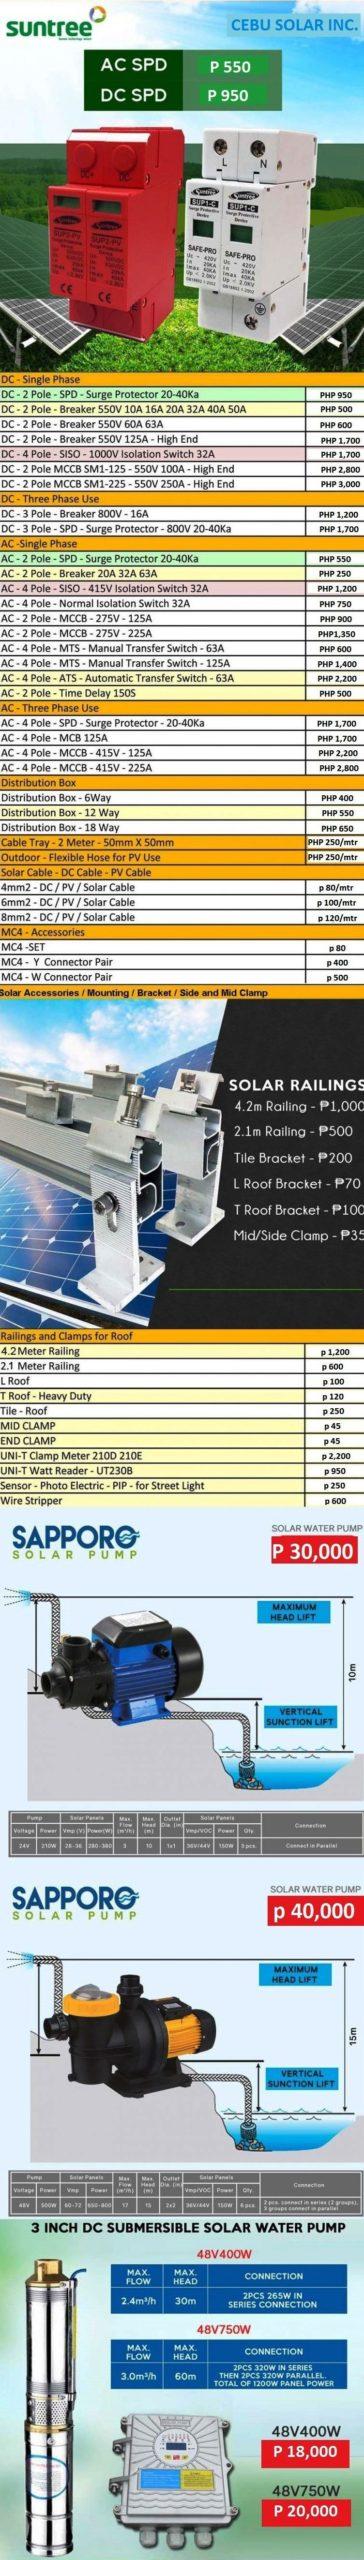 Cebu Solar Web Price List